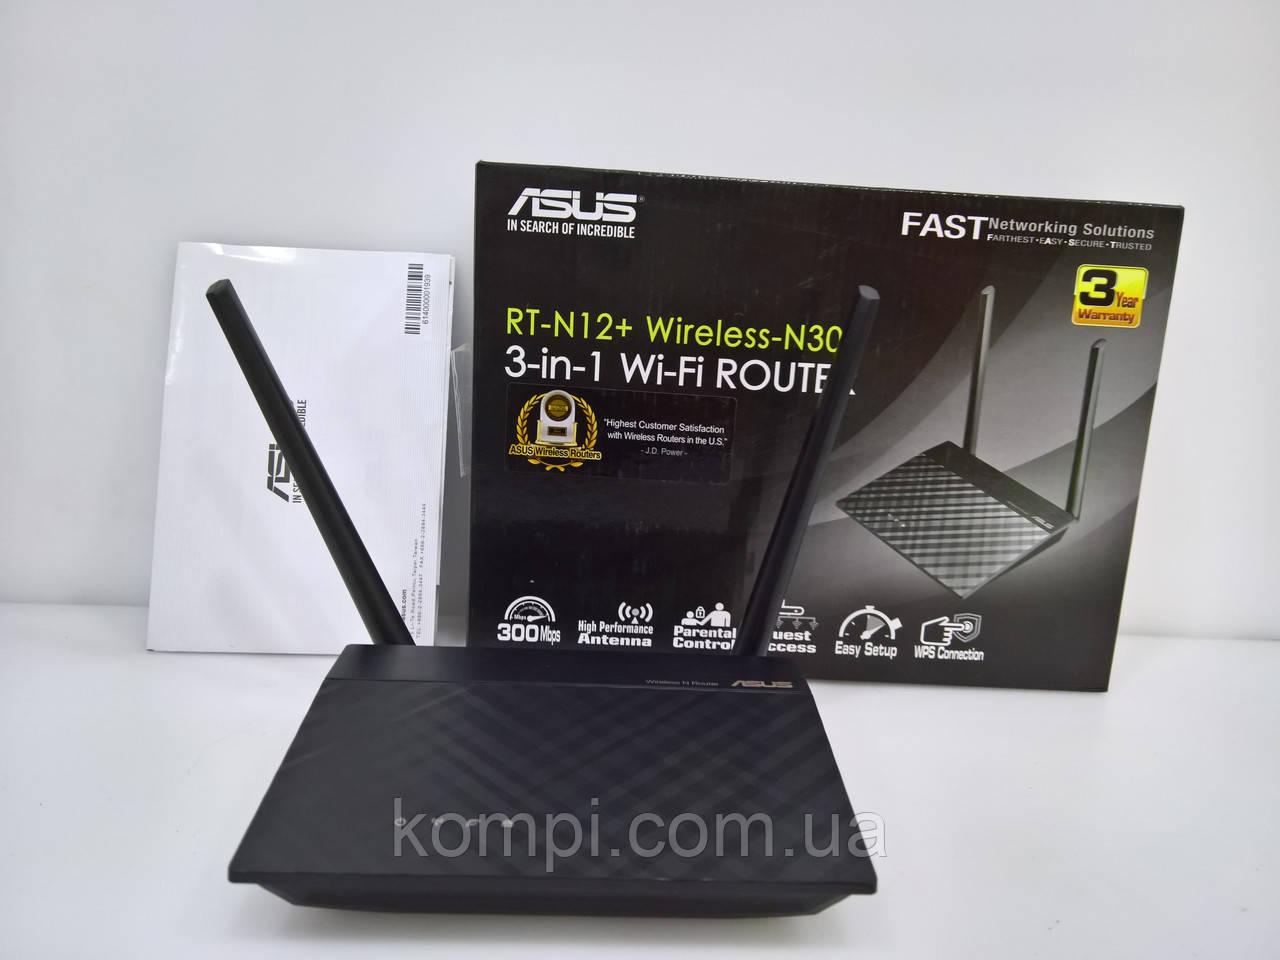 Asus RT-N12+ Wireless-N300 Маршрутизатор /Роутер Wi-Fi